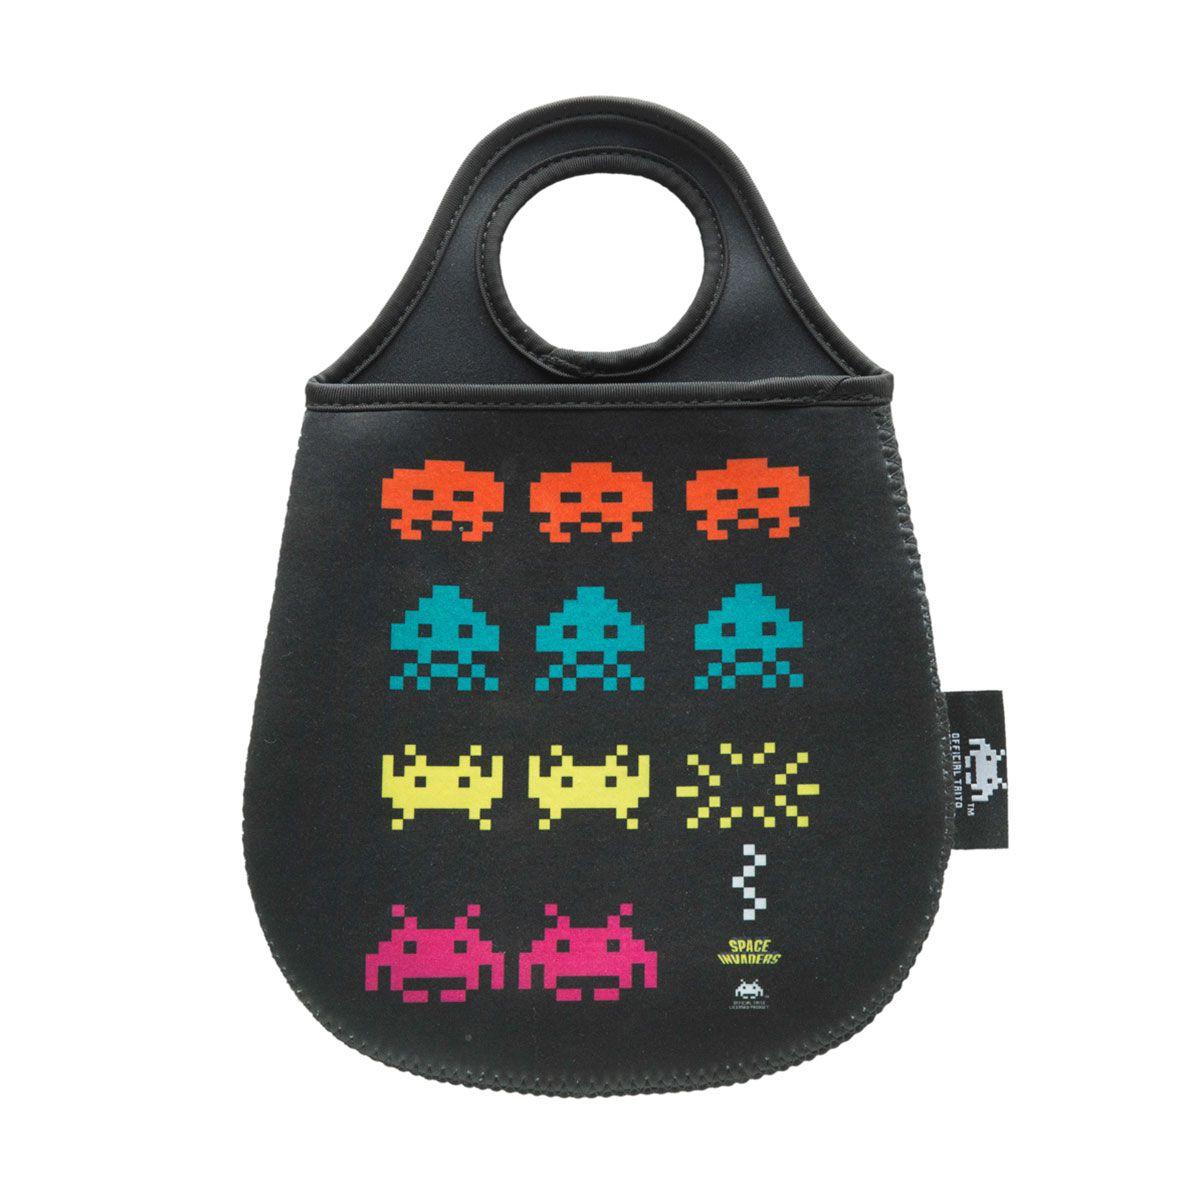 Lixeira para Carro - Space Invaders Game Geek